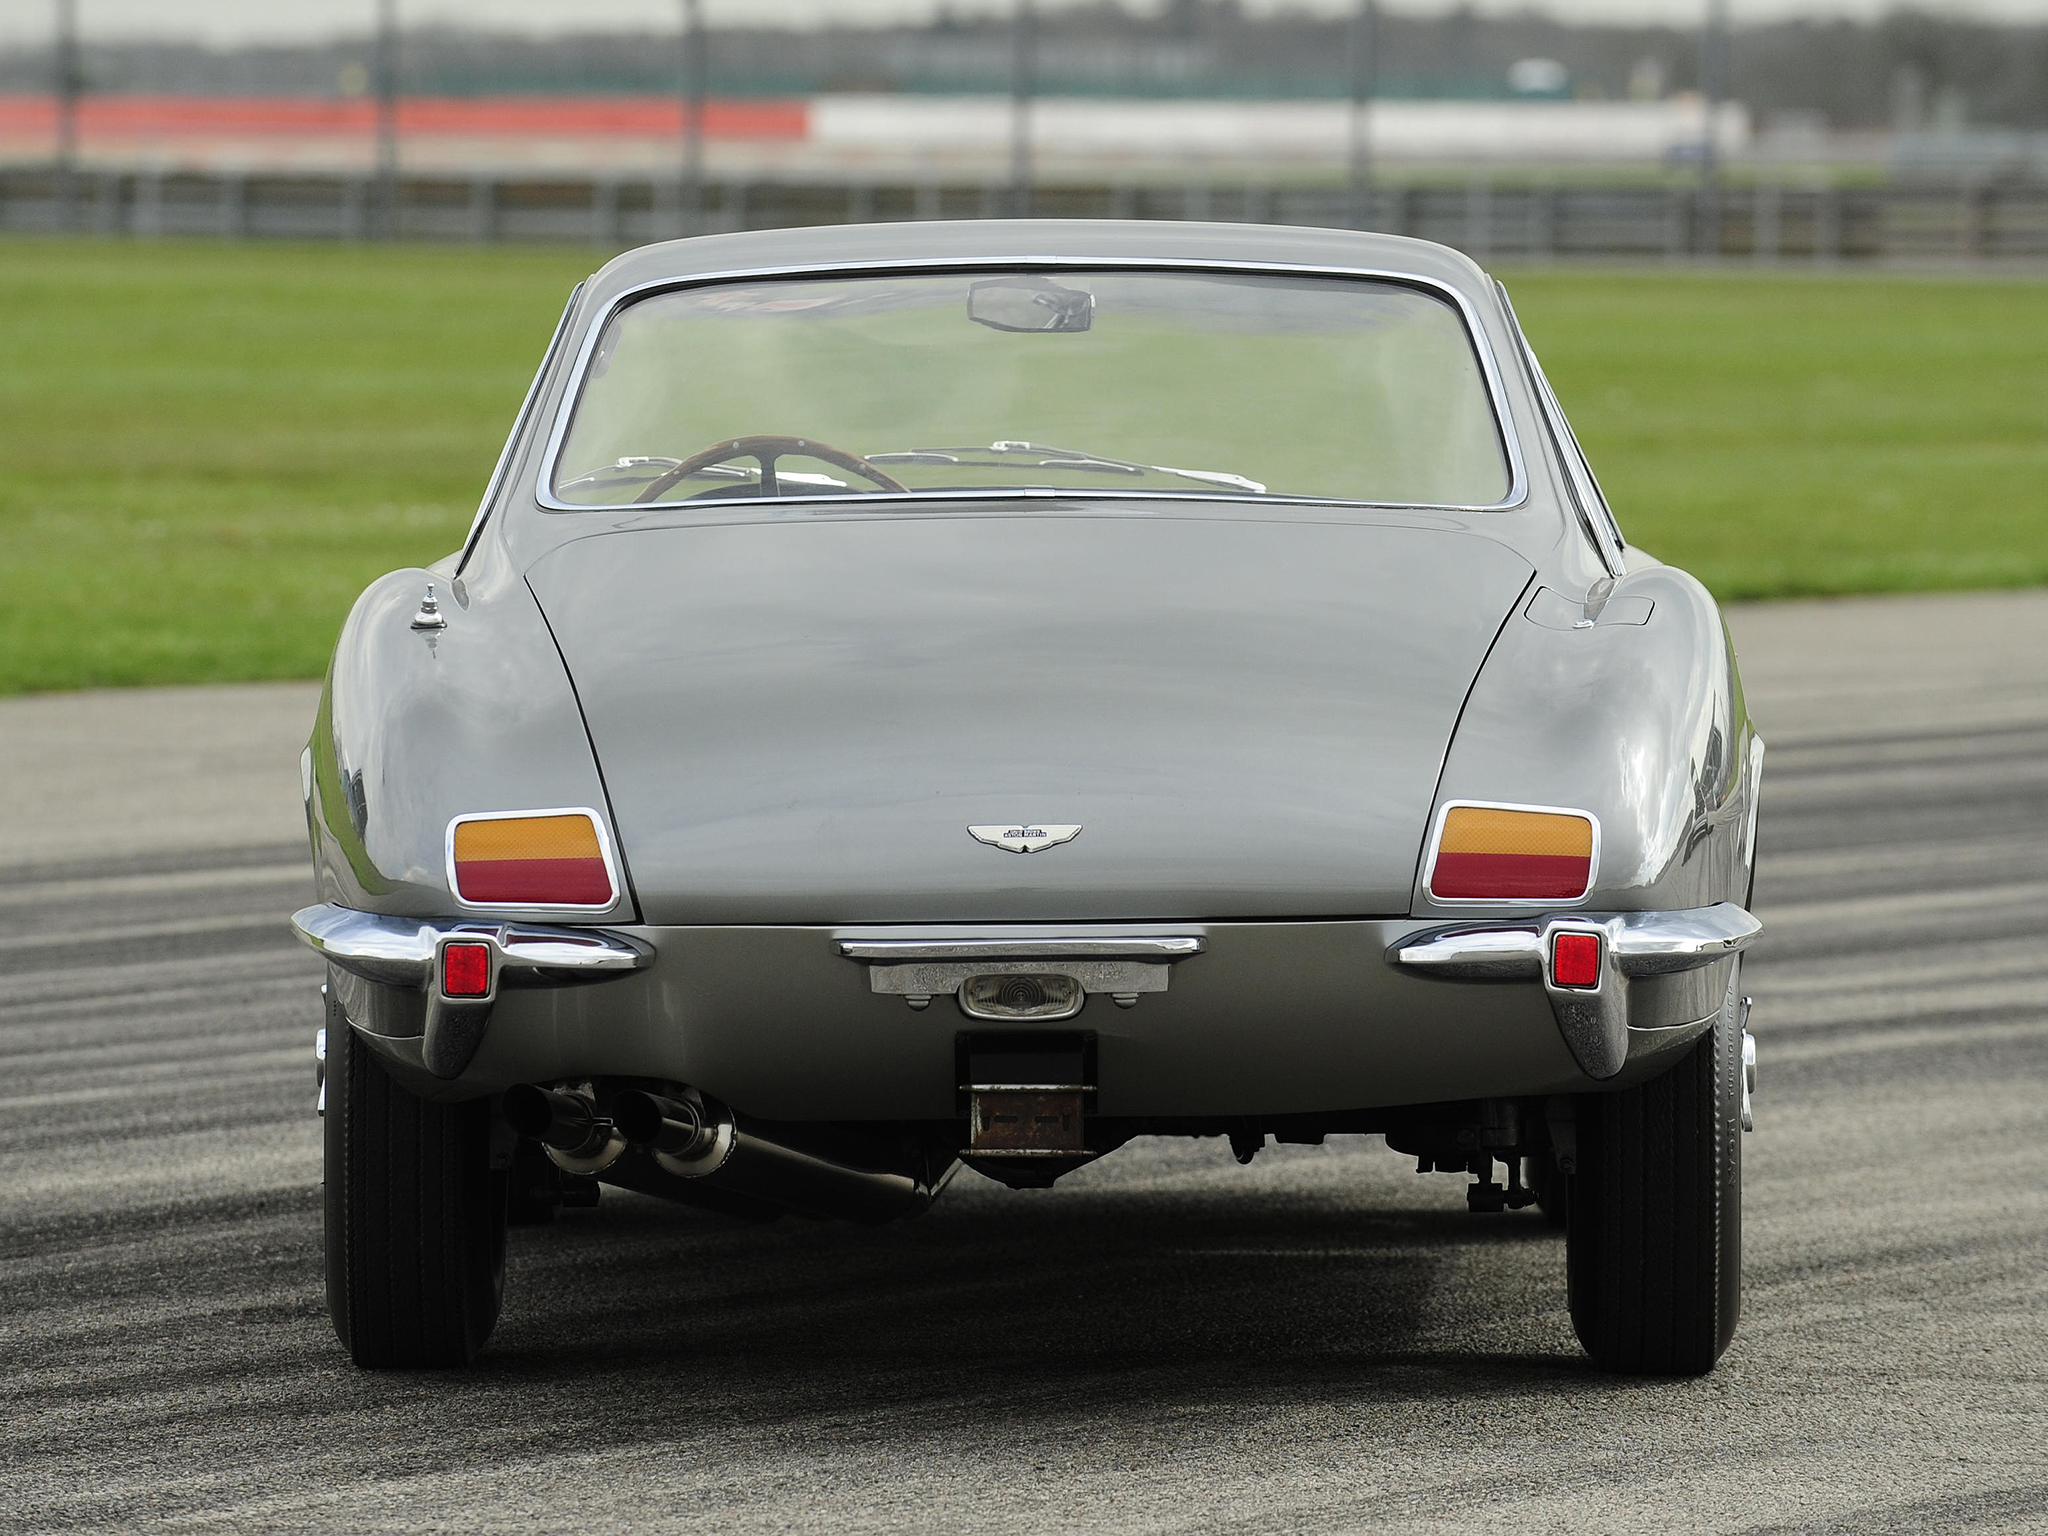 Aston Martin Jet DB4 GT Bertone